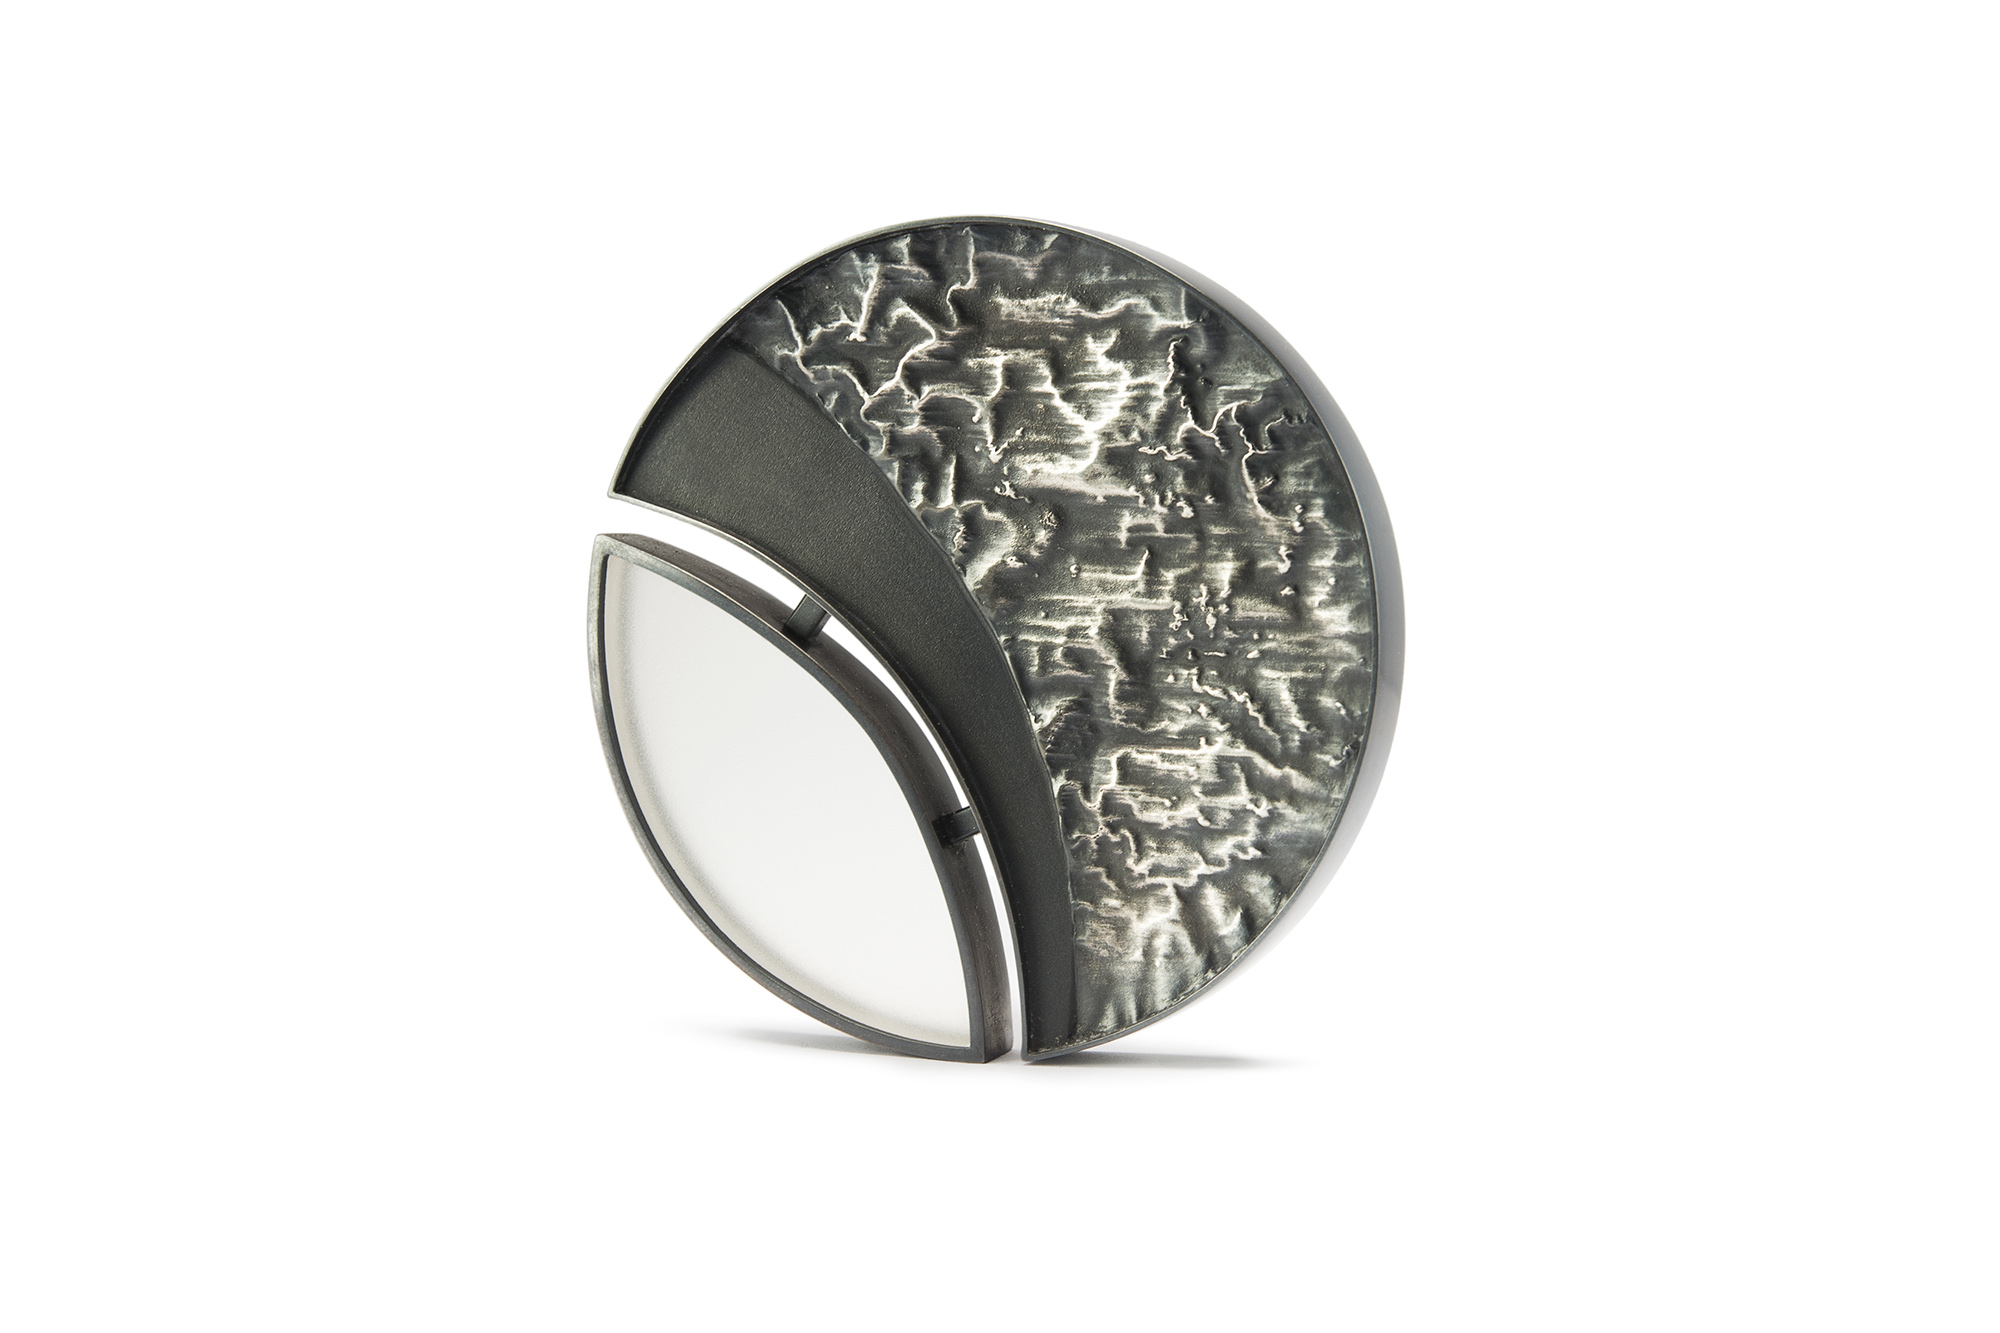 circle-brooch-2.jpg